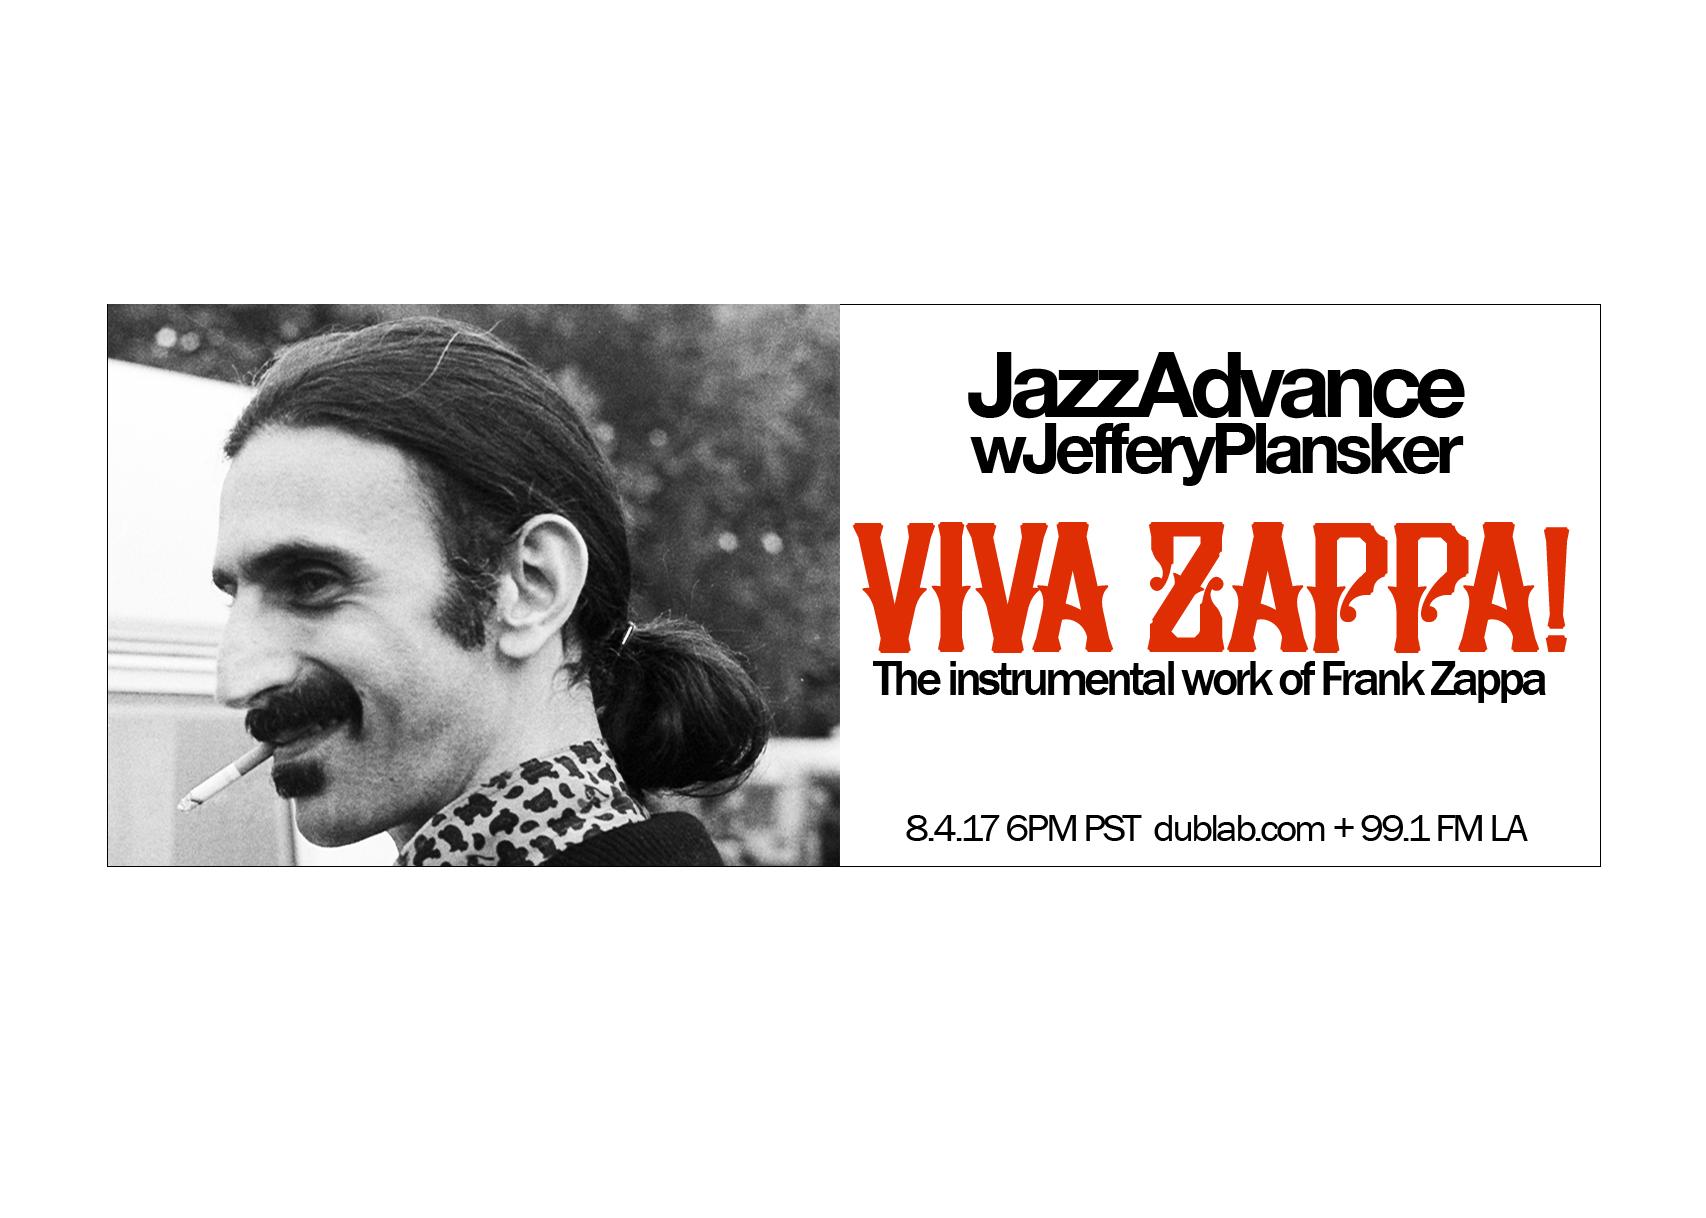 VIVA ZAPPA FINAL-2